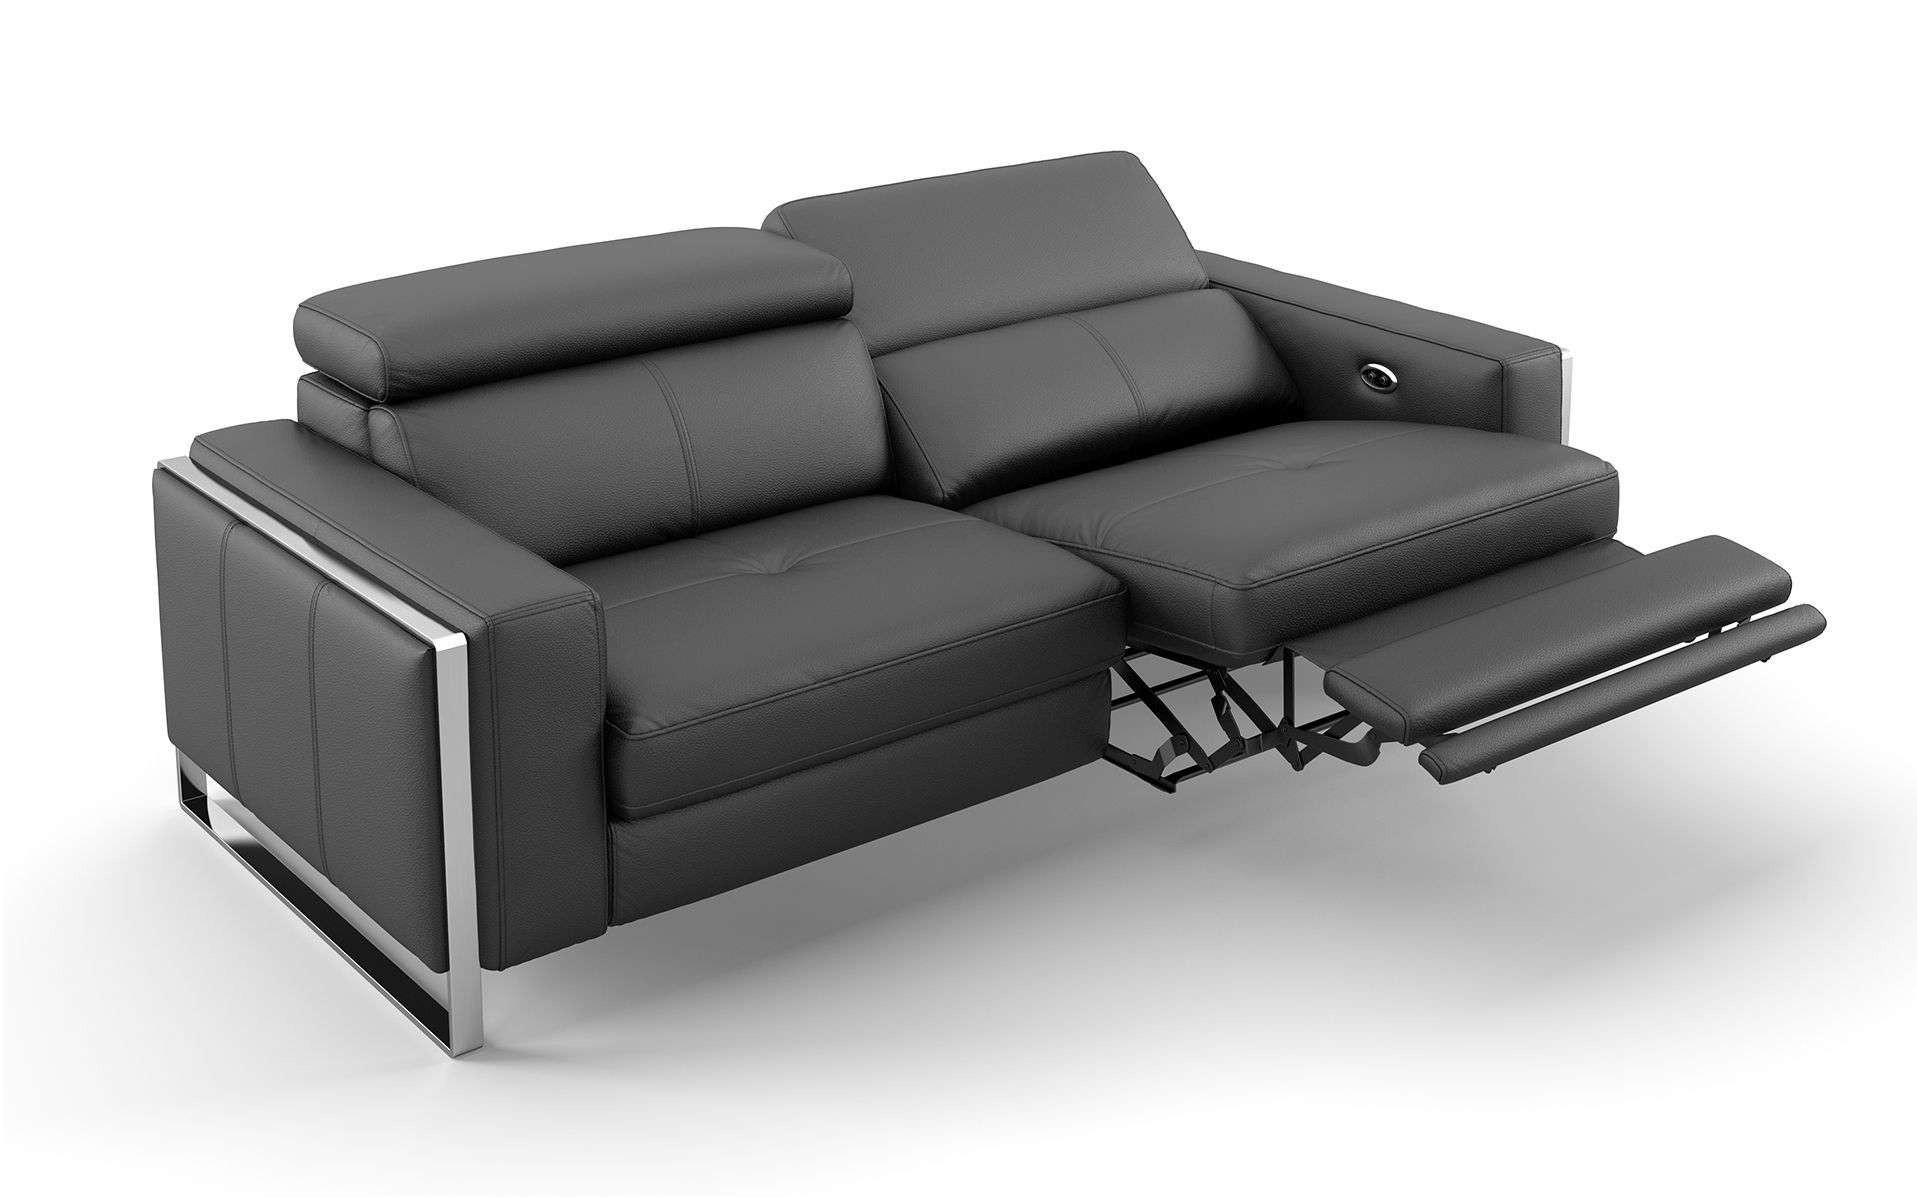 Mehrzahl Sofa  32 Neu Zweisitzer sofa Einzeln Ausziehbar Foto Mehrzahl